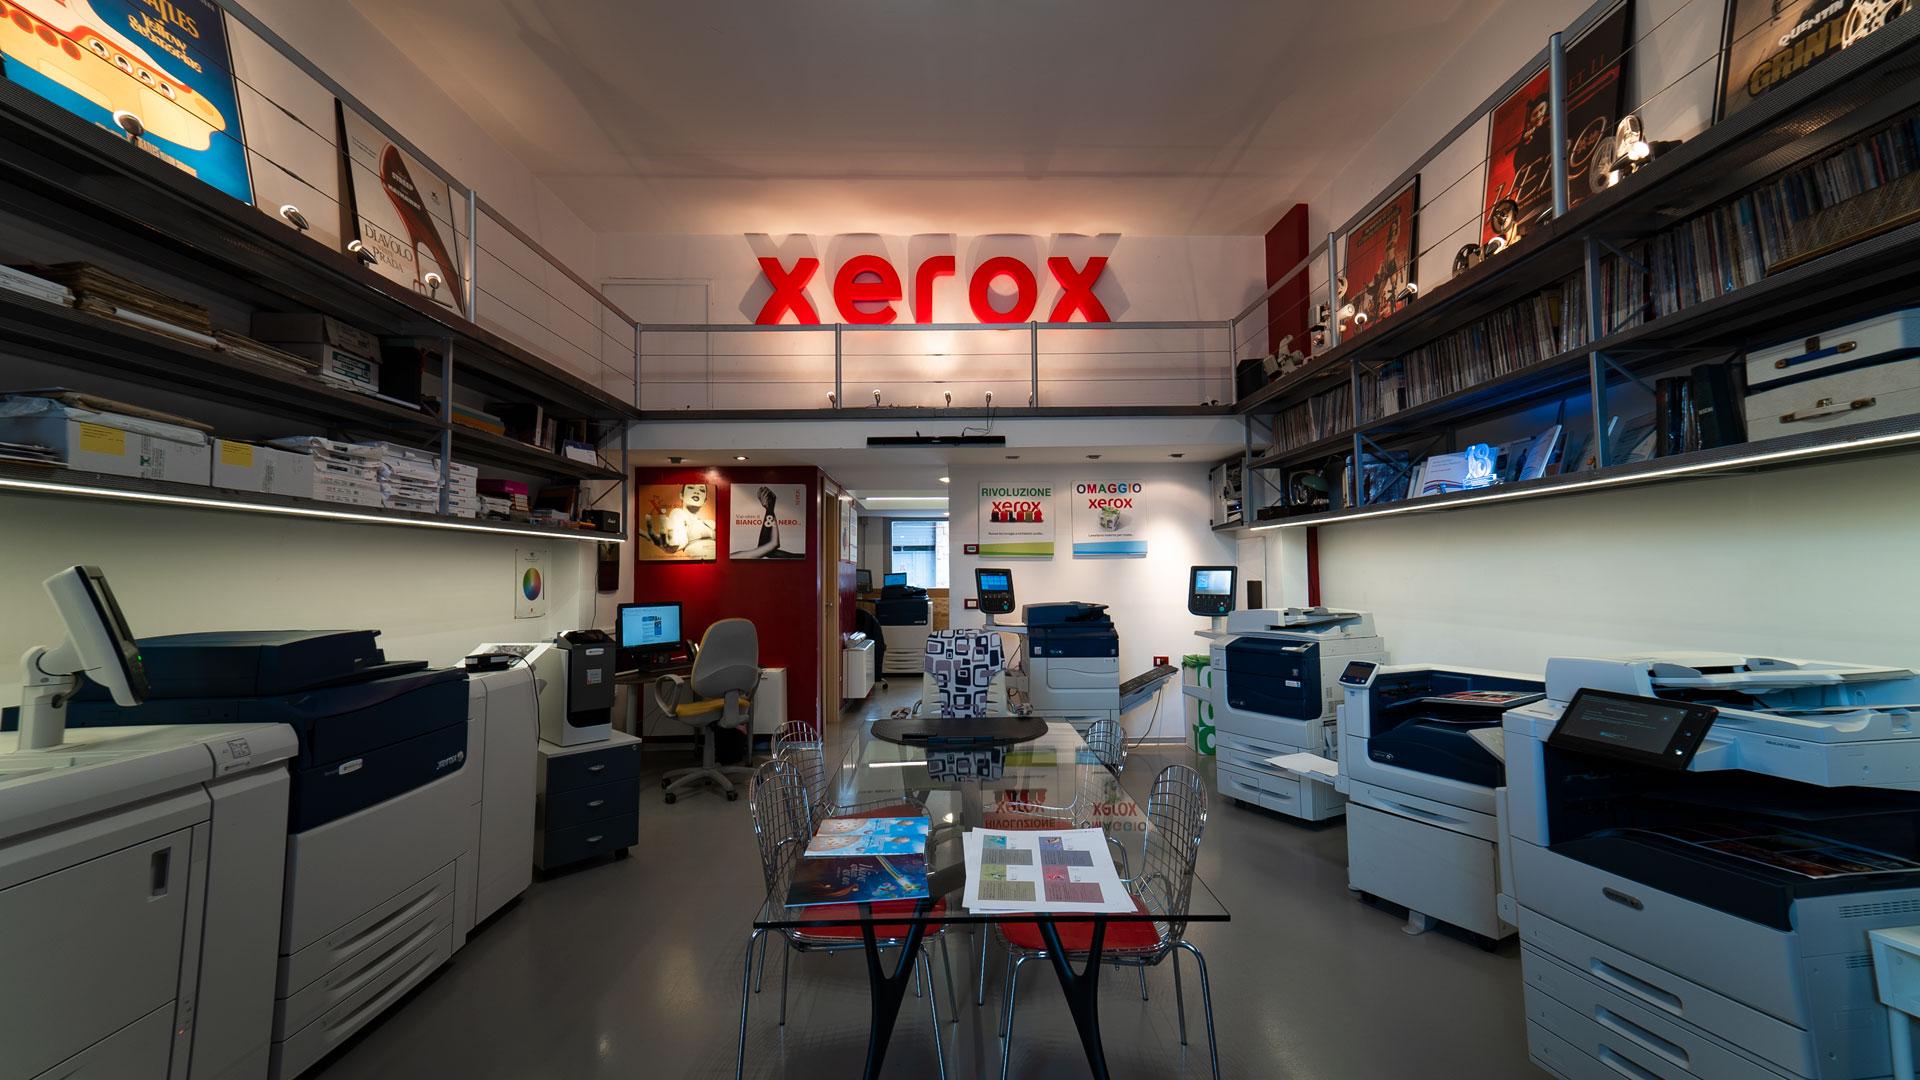 Sale & Service Informatica - Show Room Xerox